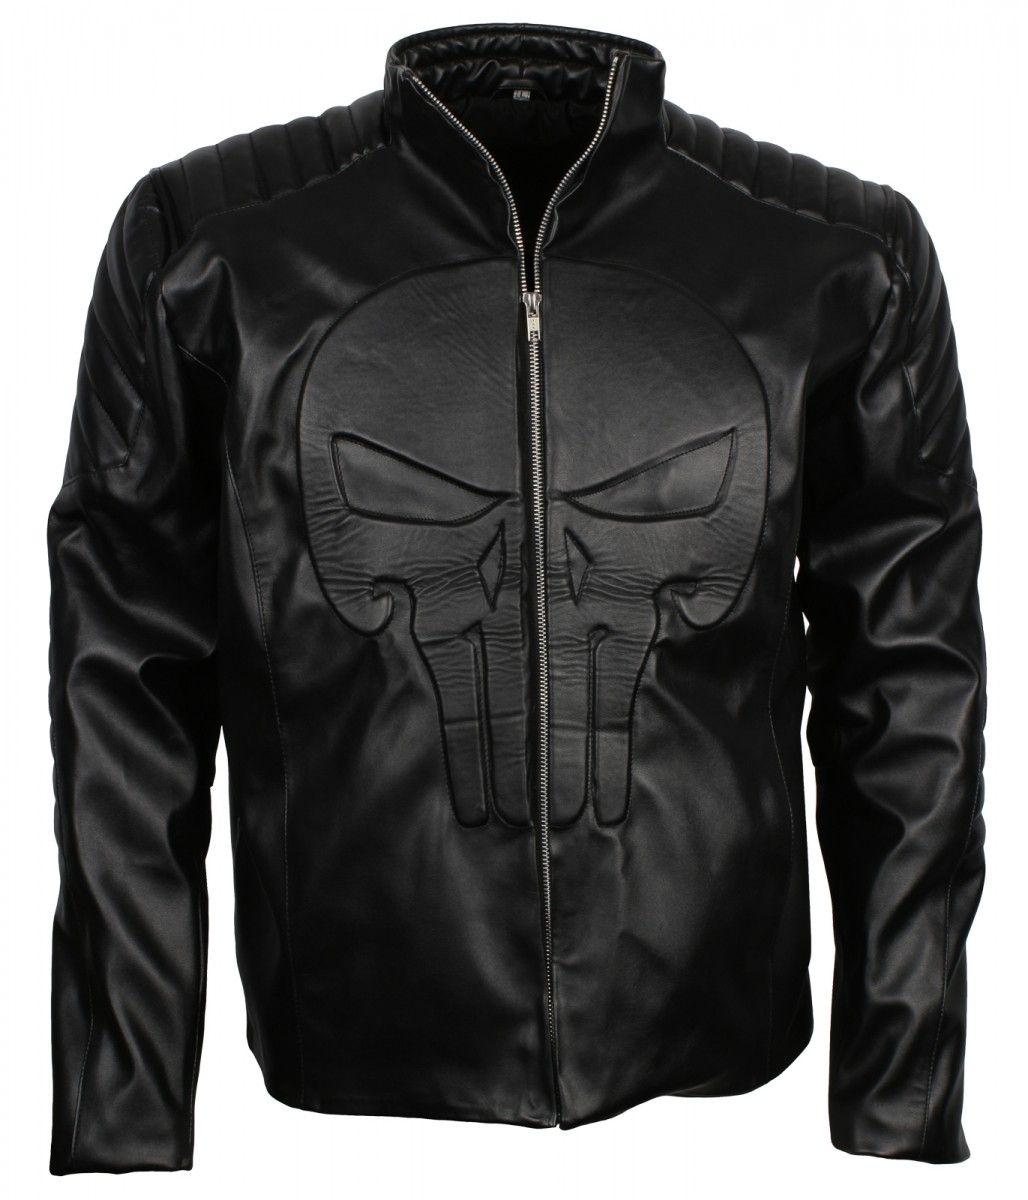 Punisher Men S Black Faux Leather Jacket Us Leather Mart Black Faux Leather Jacket Leather Jacket Faux Leather Jackets [ 1200 x 1028 Pixel ]